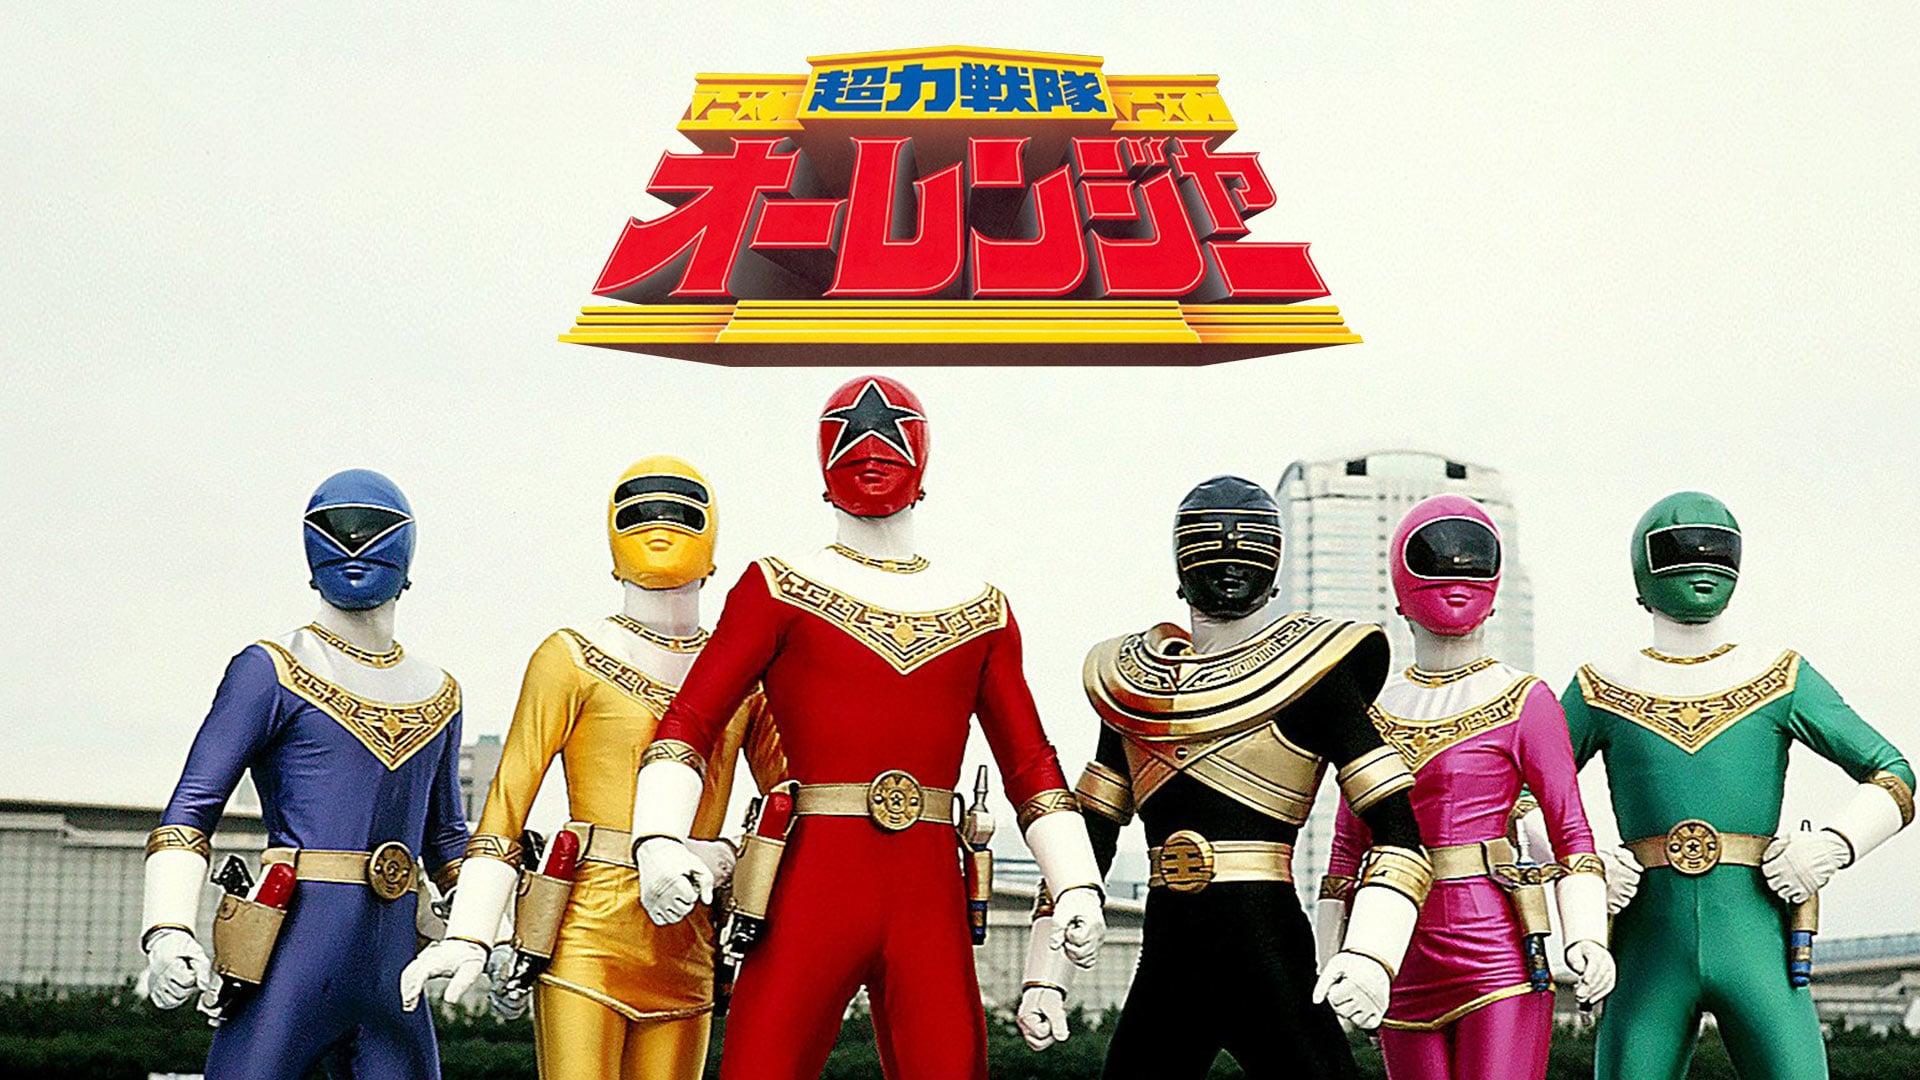 Chouriki Sentai Ohranger The Movie